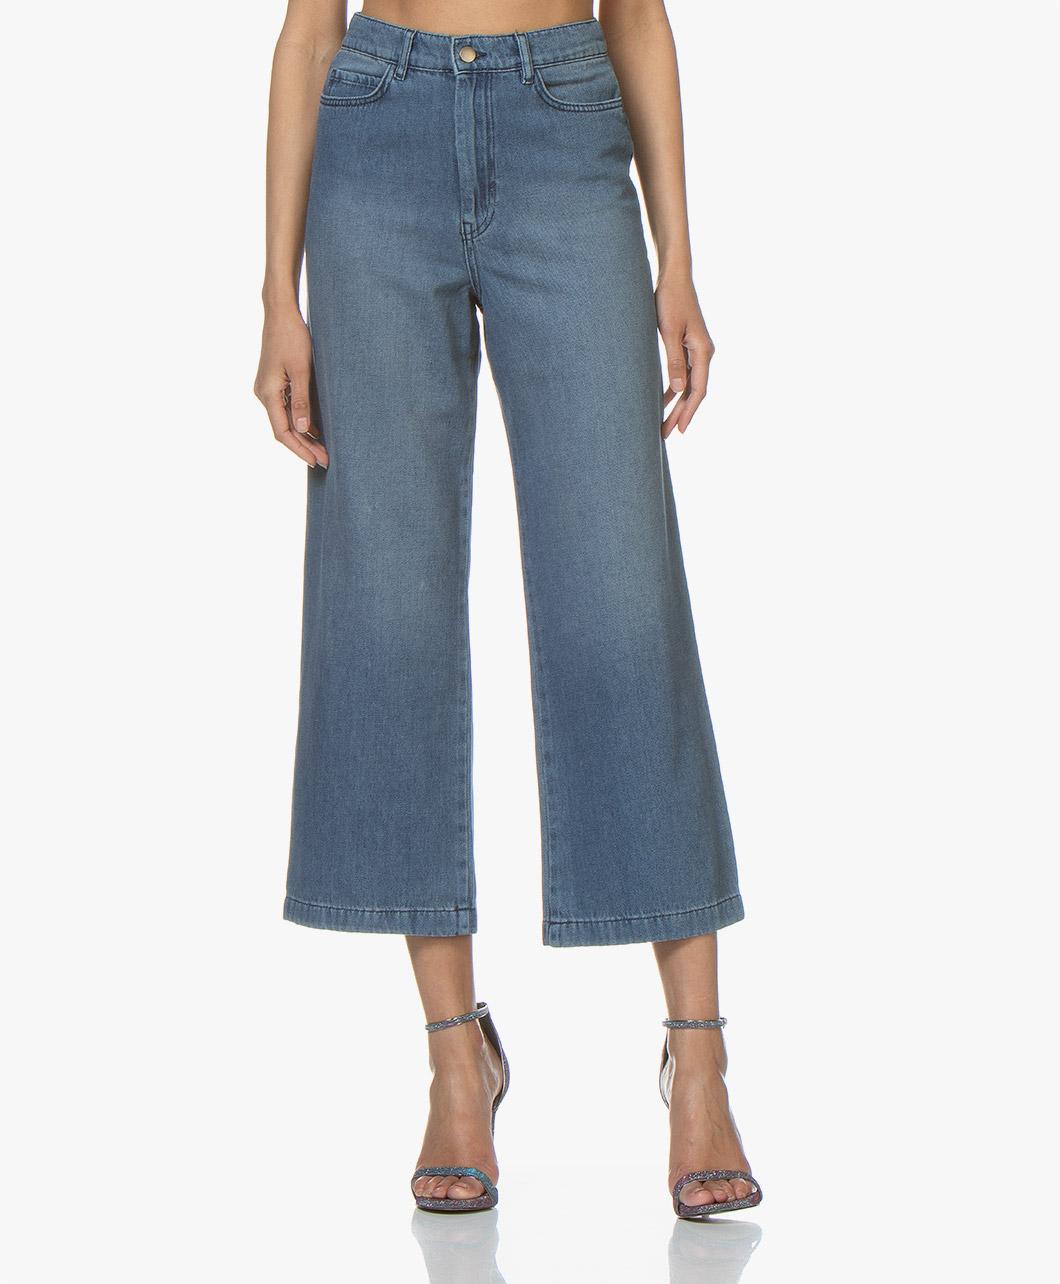 Afbeelding van ba&sh Jeans Talent Cropped in Blue